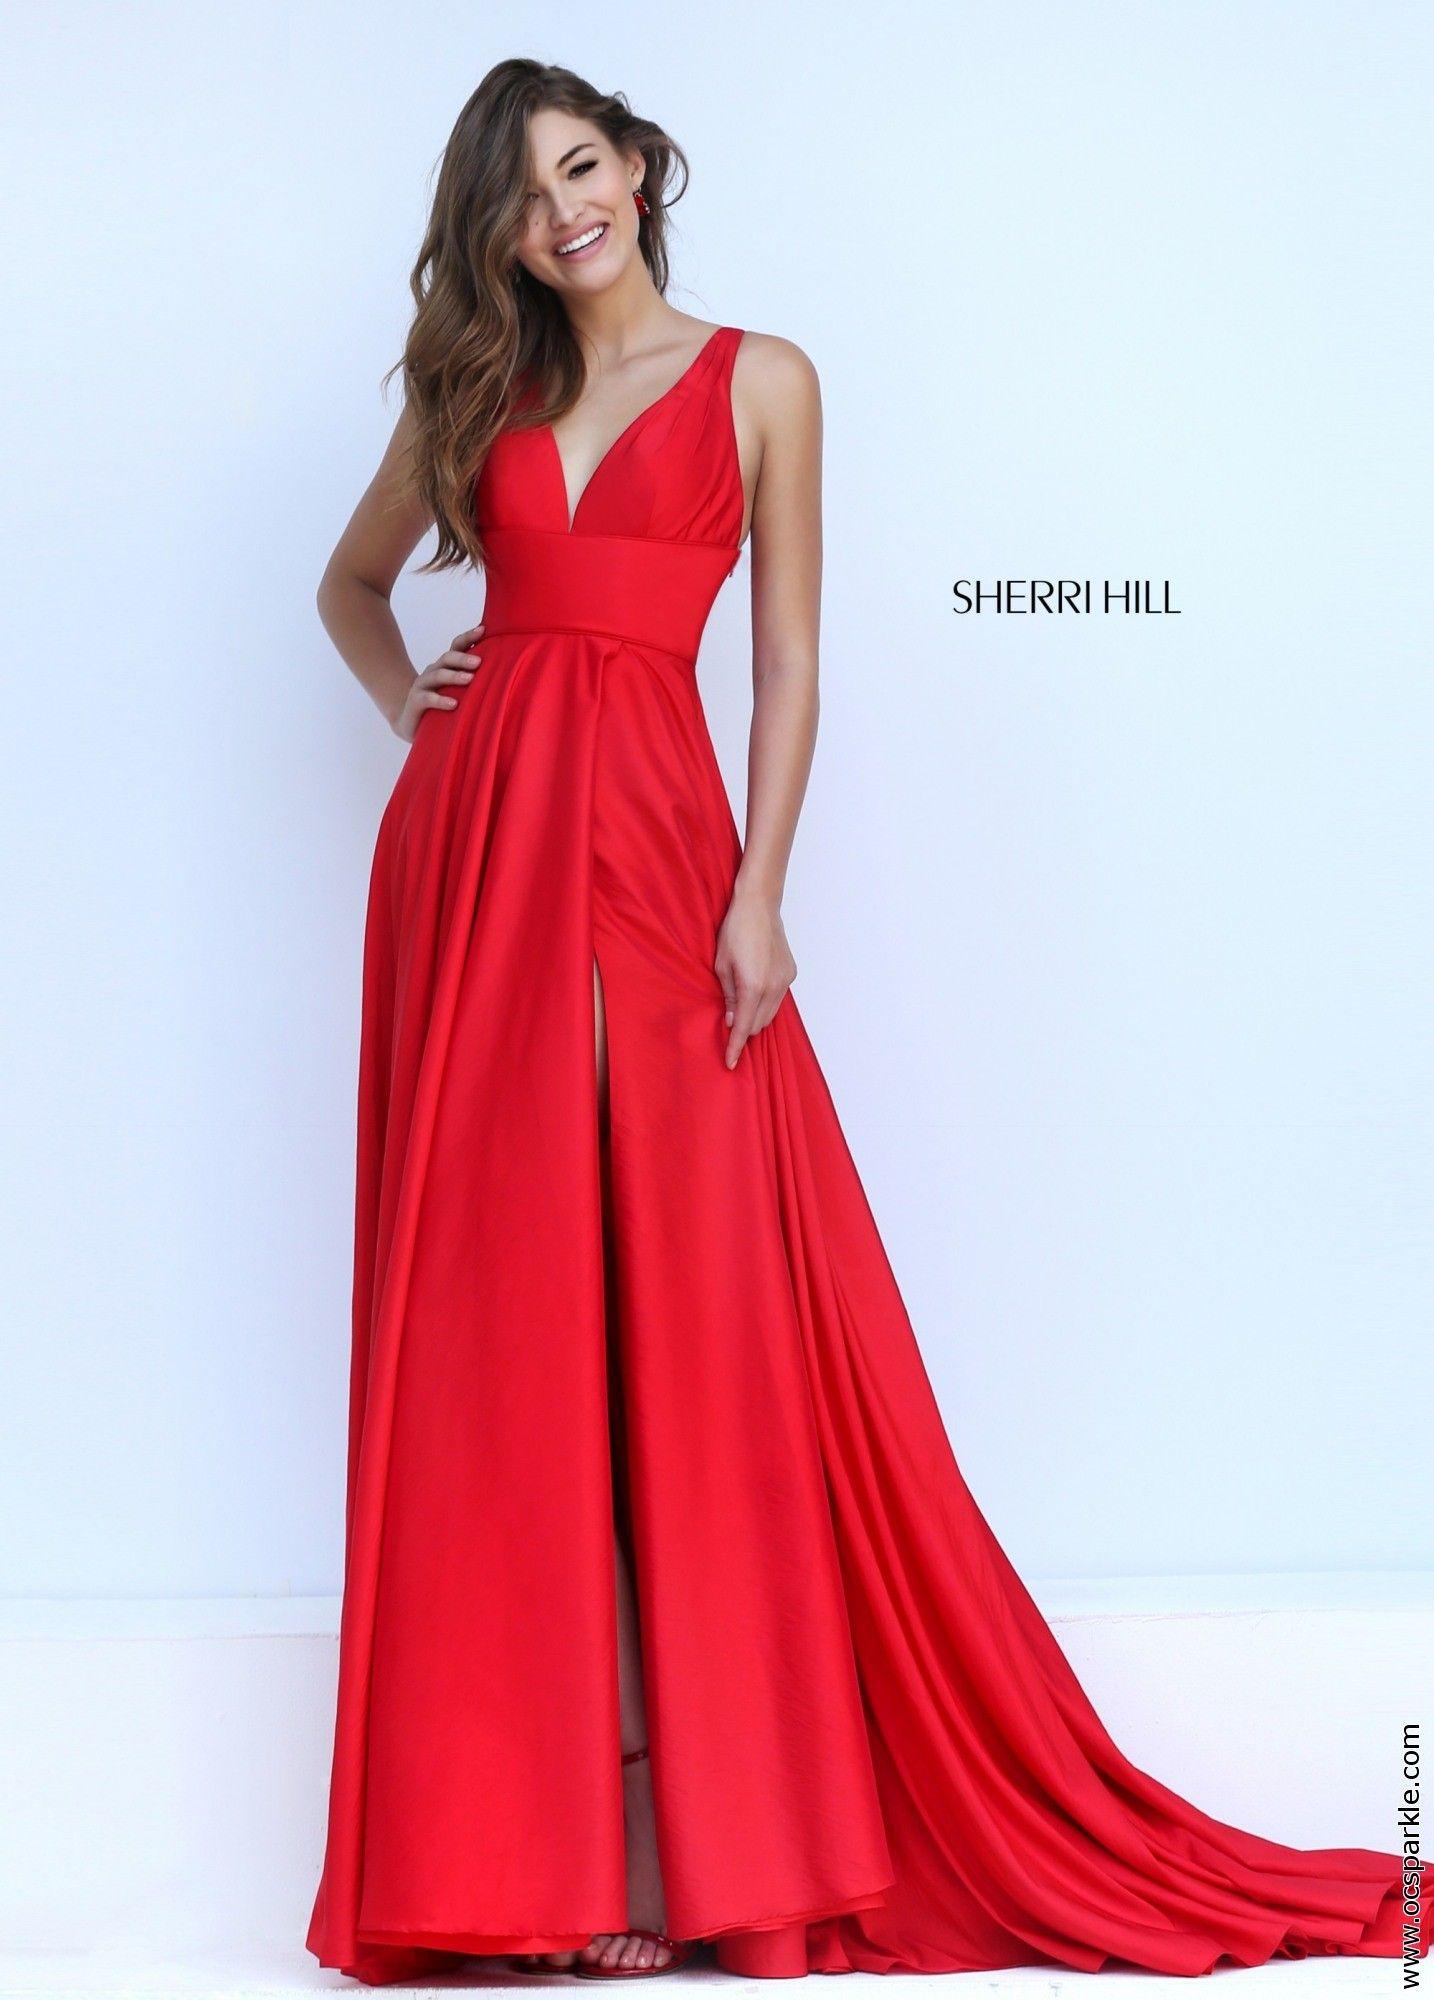 Sherri hill dresses pinterest fashion accessories